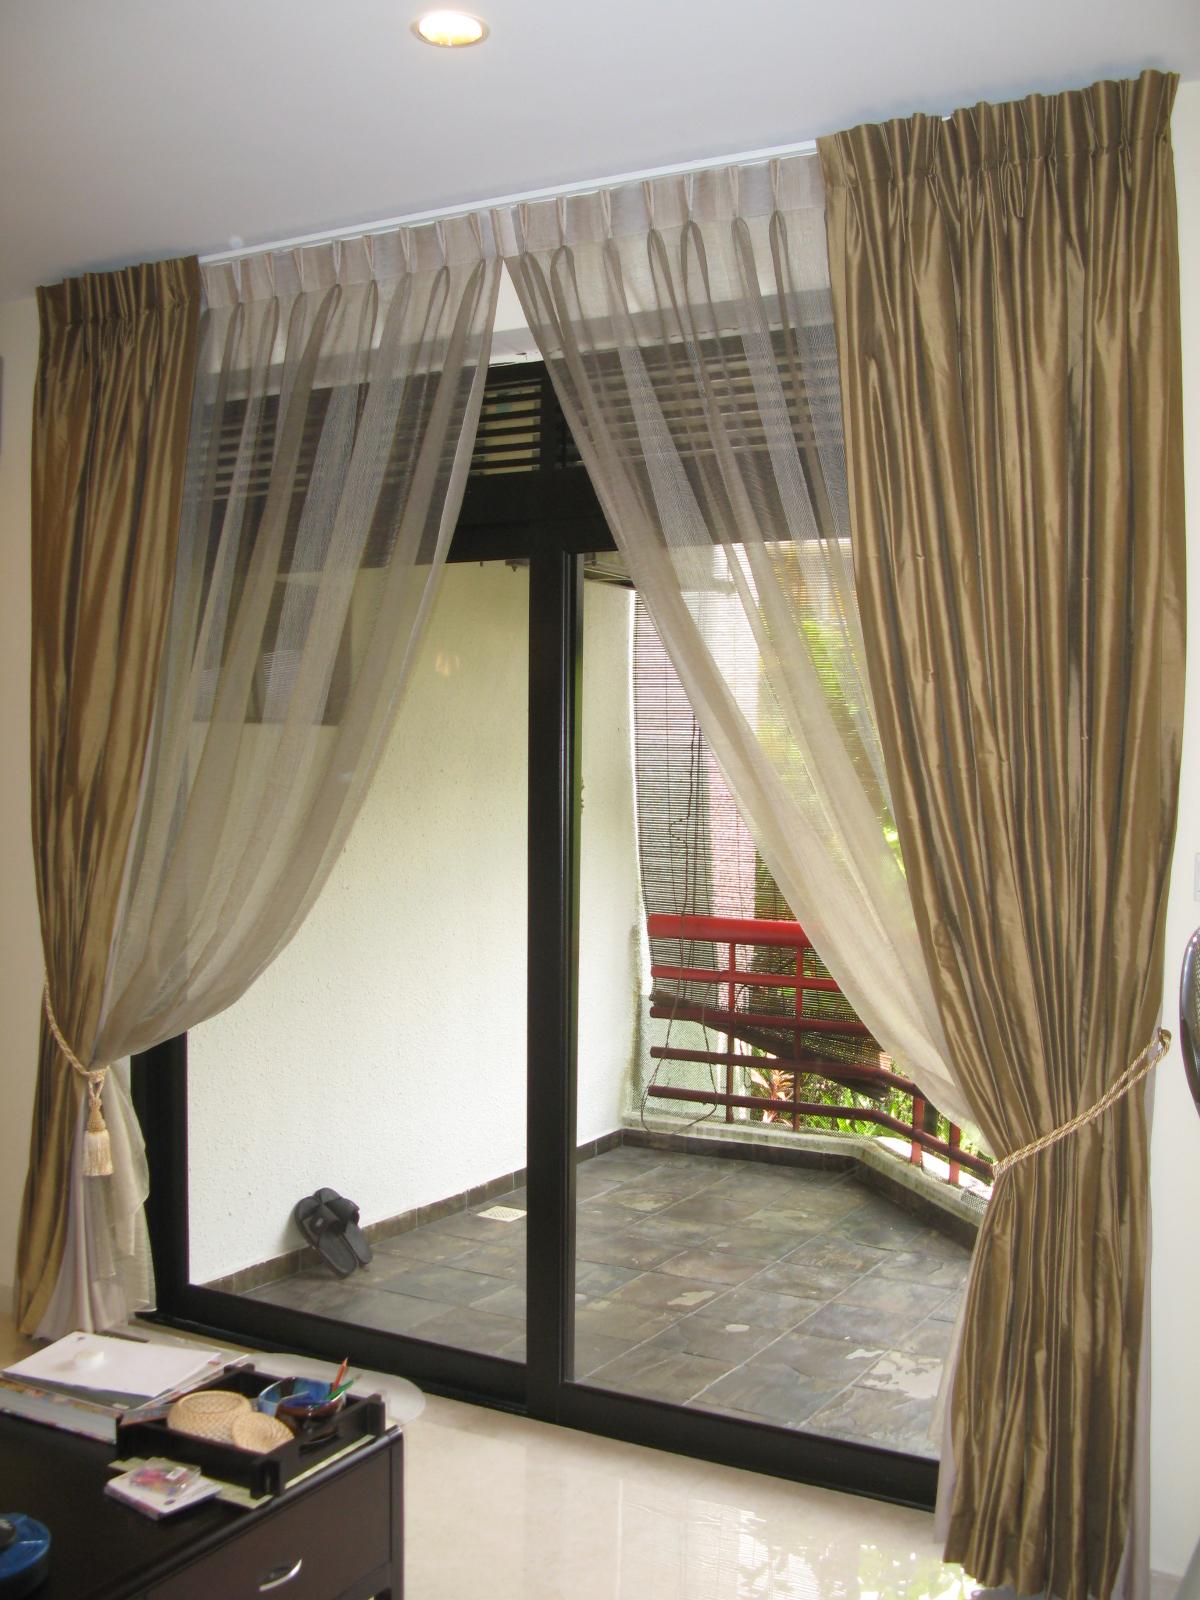 Future House Design: Stylish Interior With Window Curtain ...